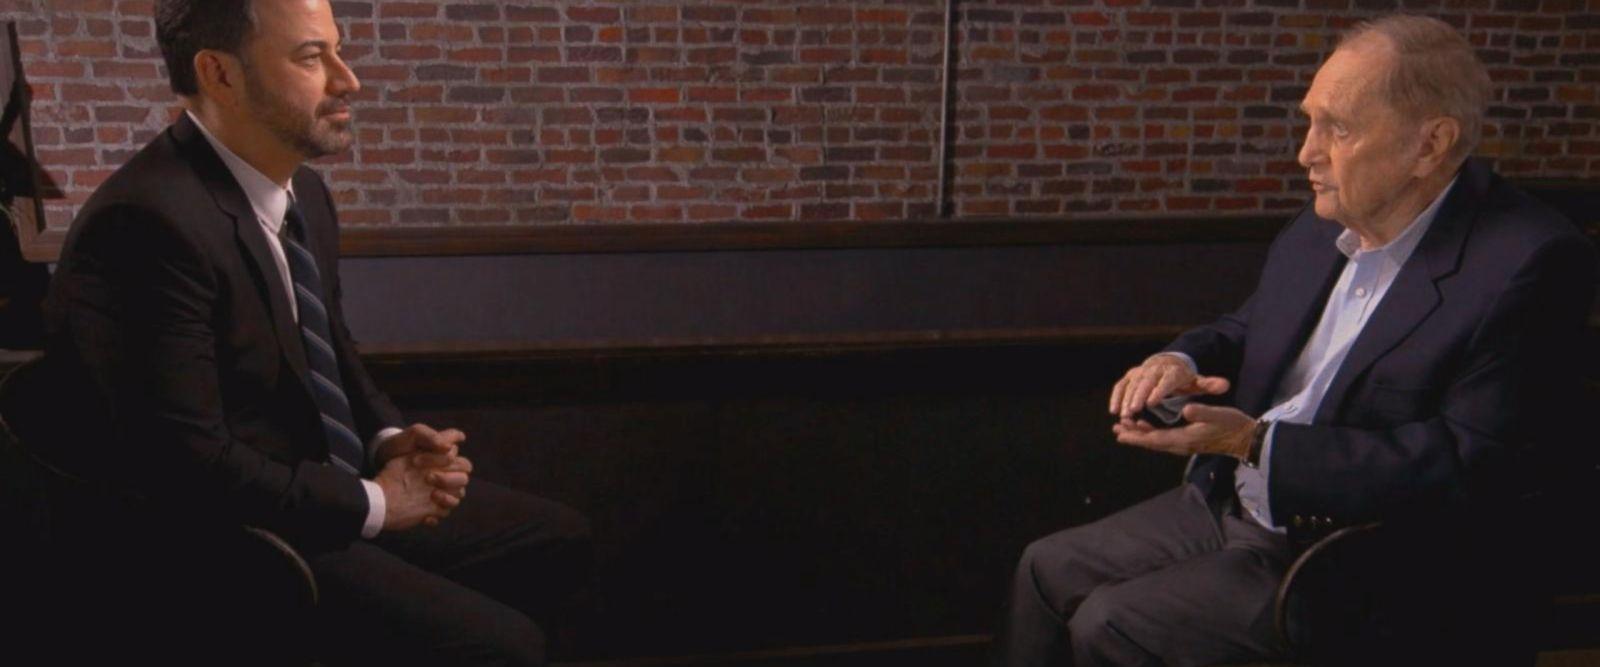 VIDEO: Bob Newhart tells Jimmy Kimmel how Johnny Carson got Don Rickles back for breaking cigarette box